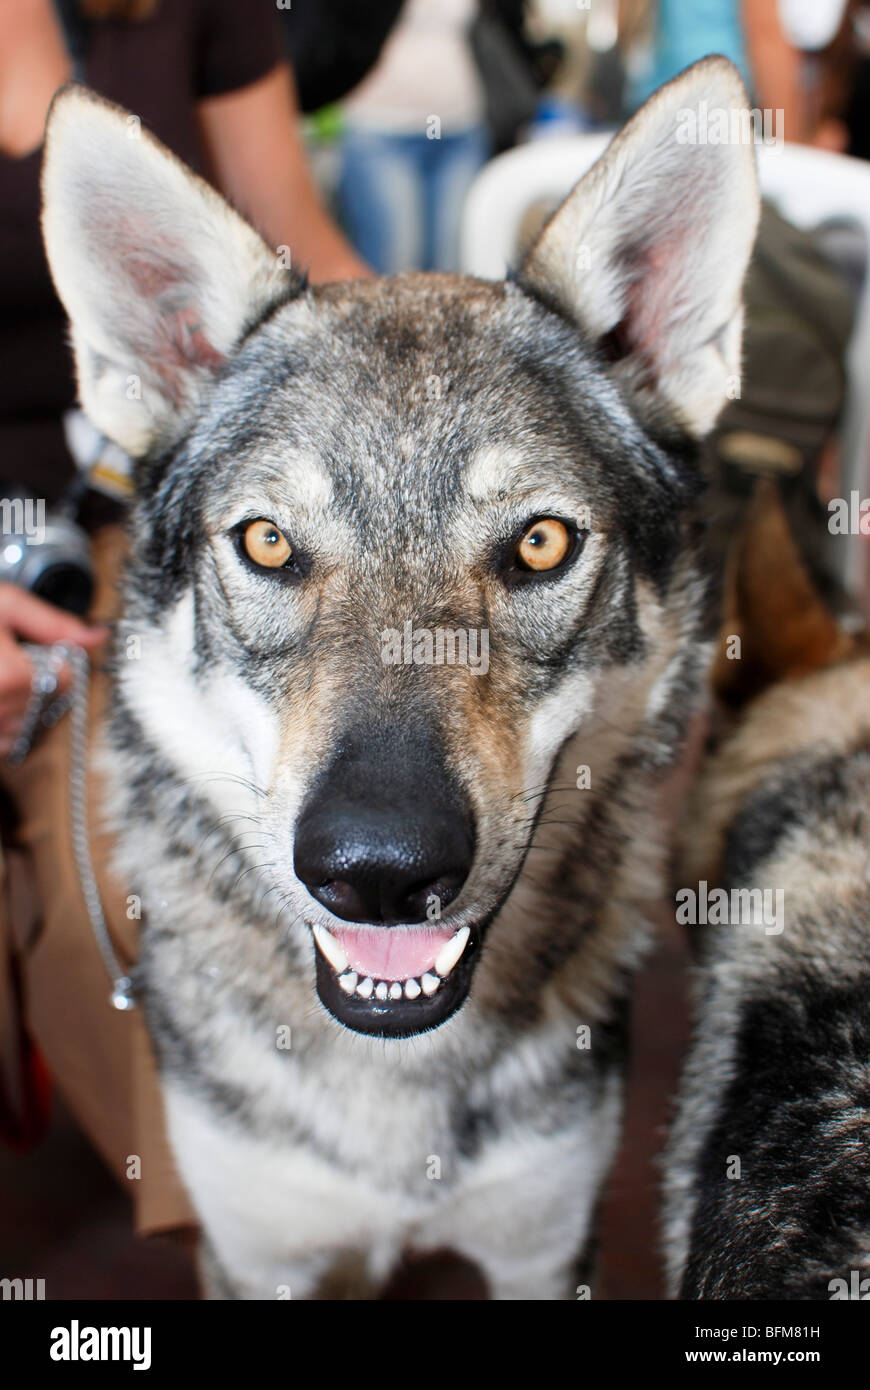 Czechoslovakian Wolfdog - Stock Image